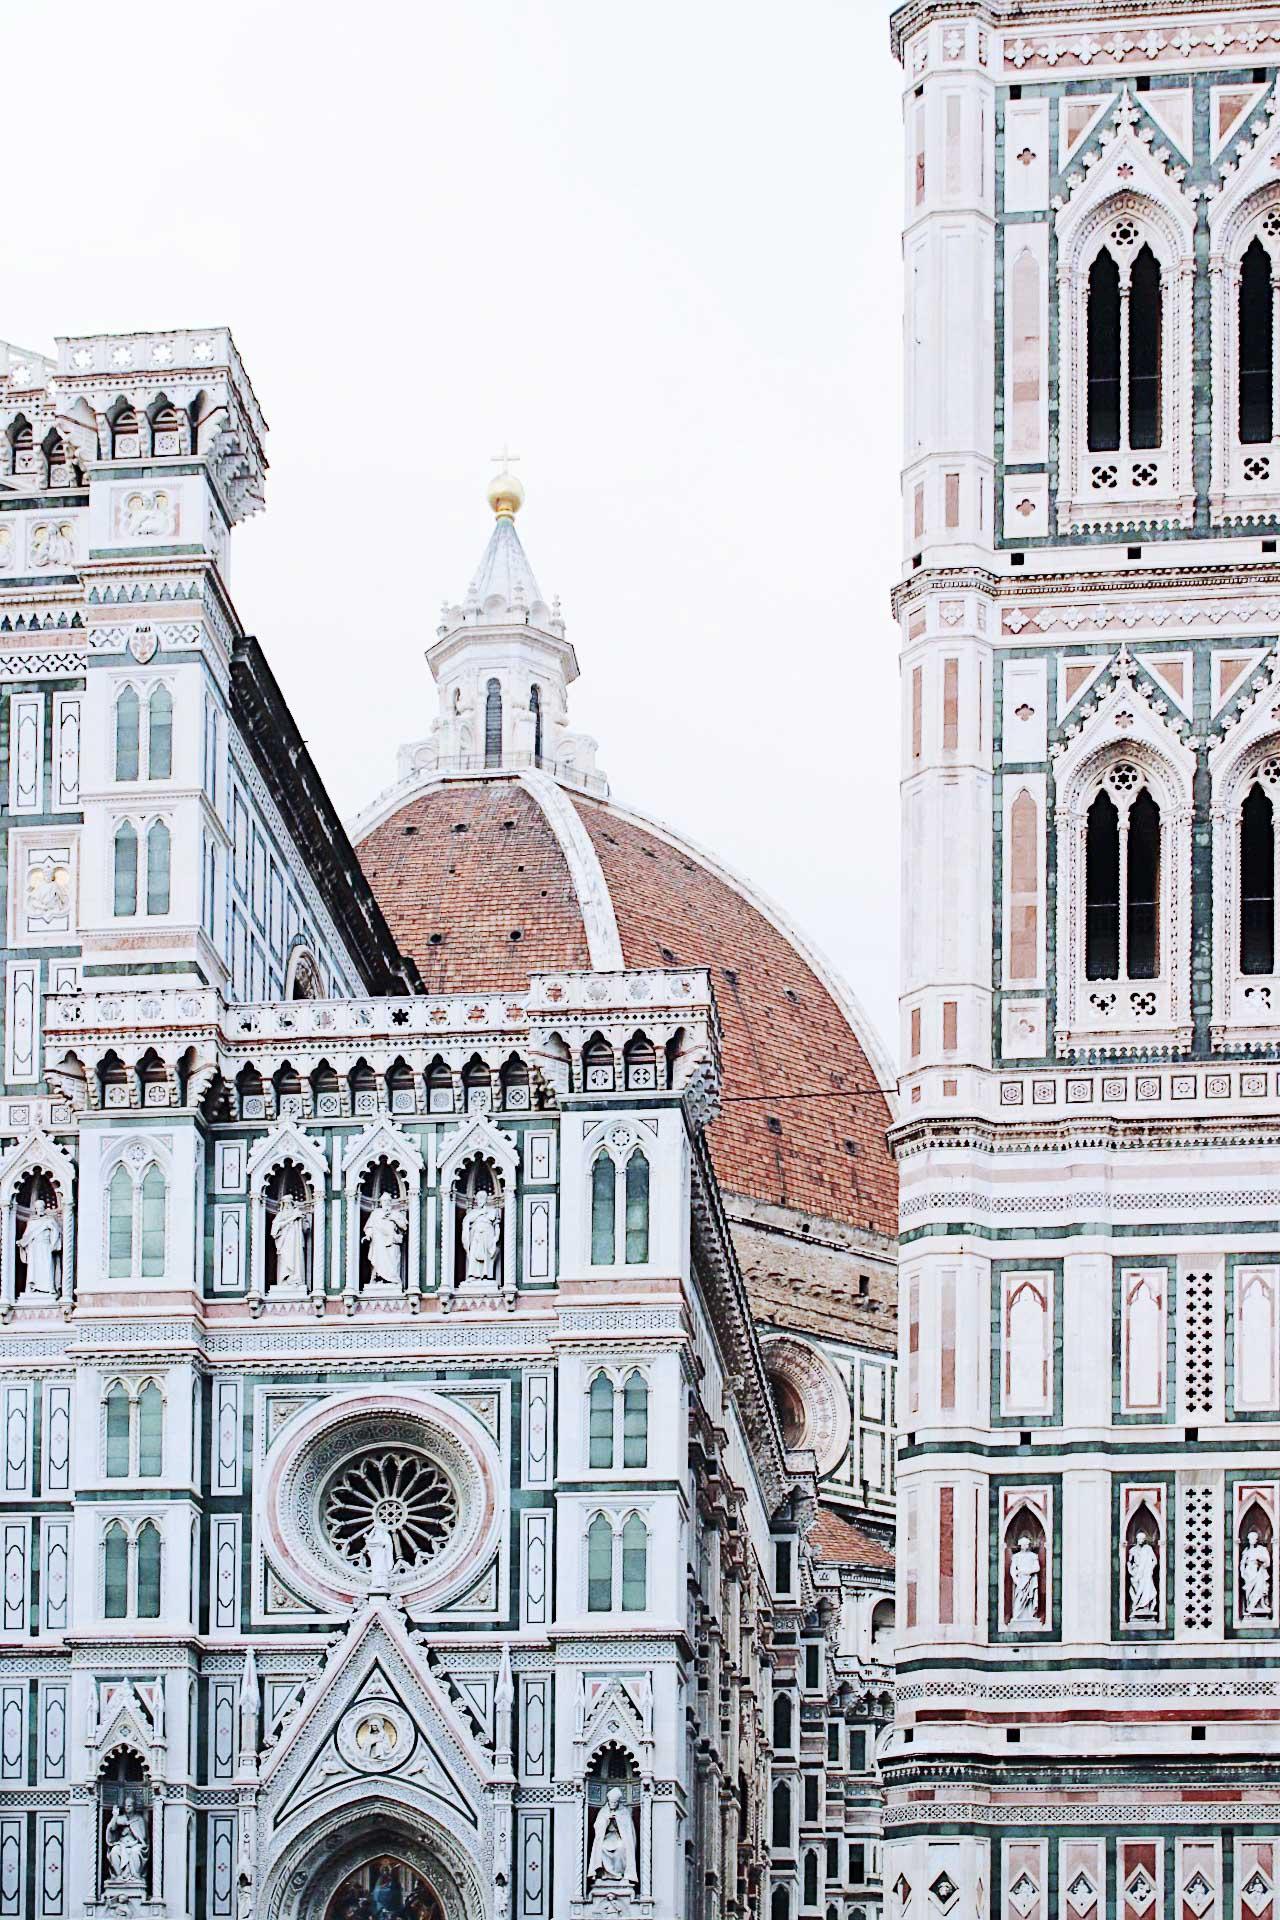 Arquitectura la cúpula del Duomo de Florencia